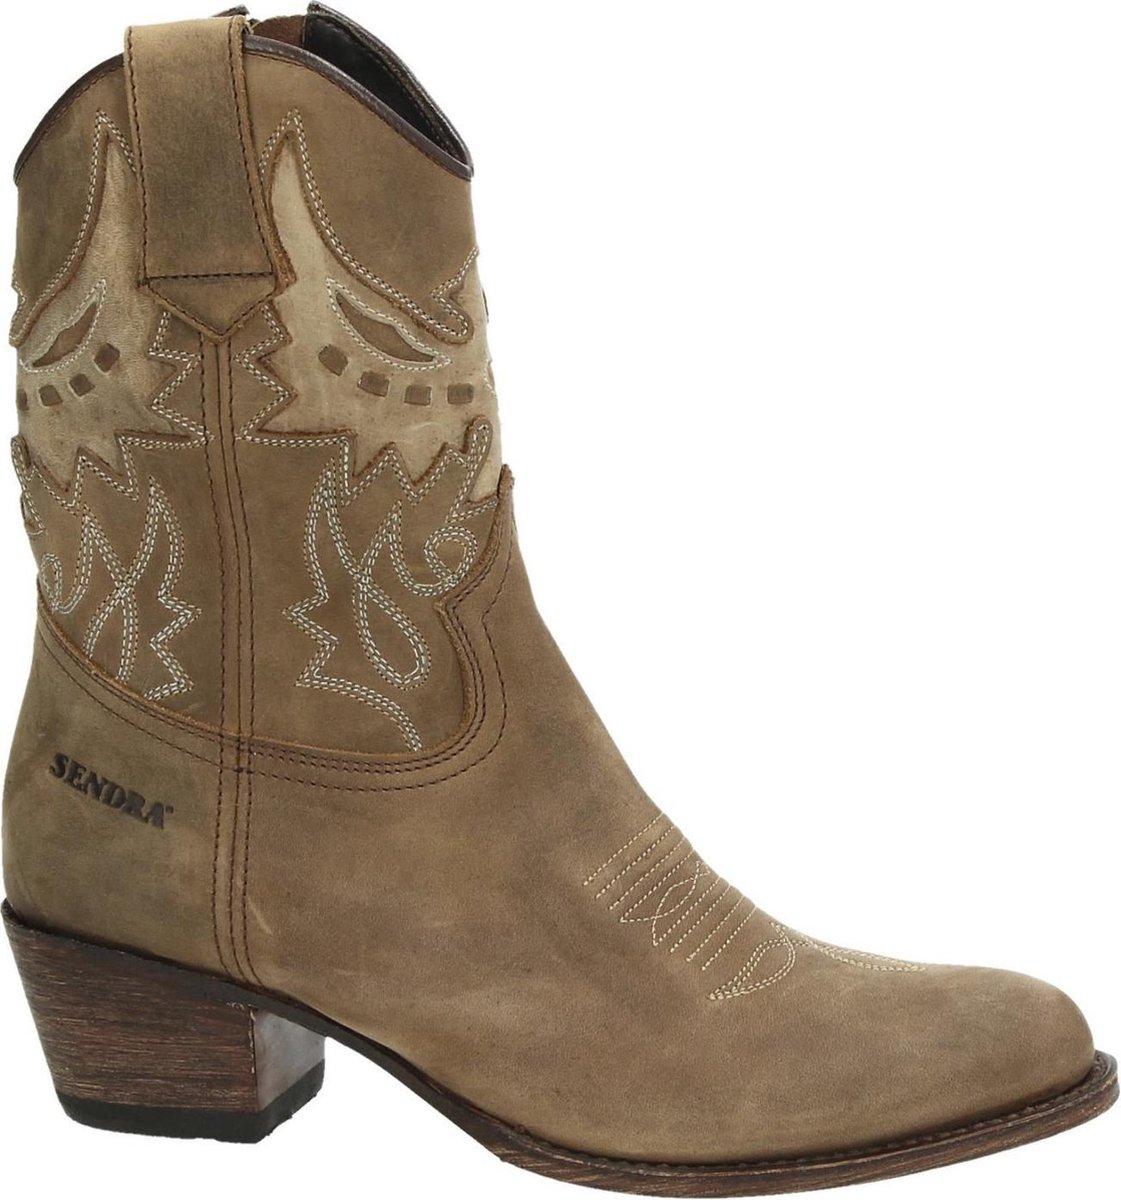 Sendra 16227 Debora cowboylaars Camel Maat 39